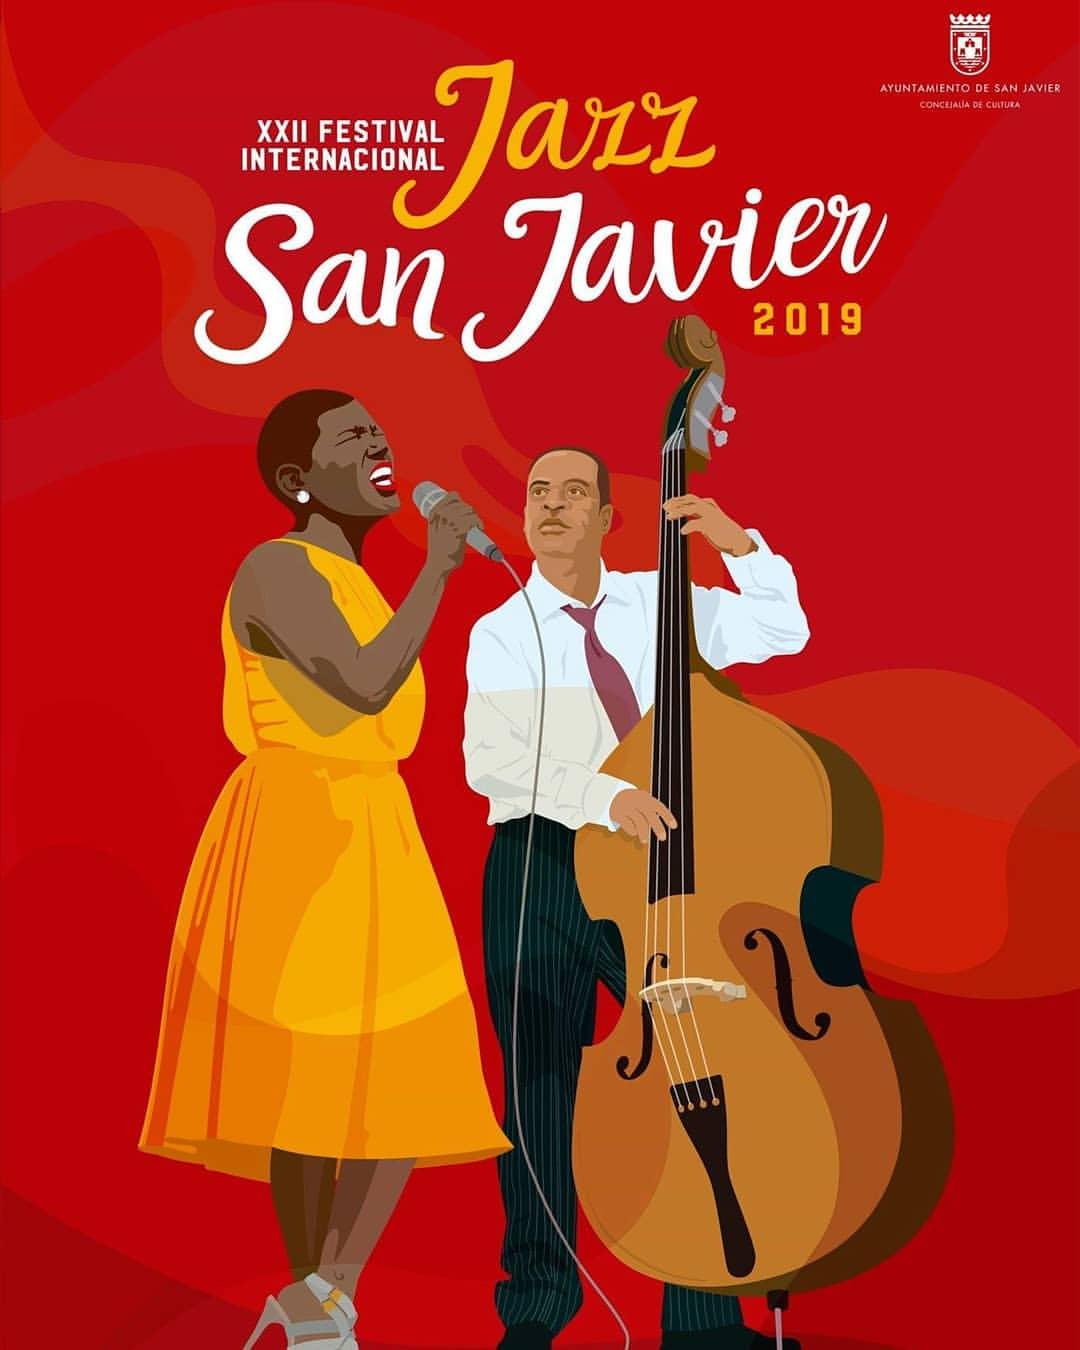 XXII Festival de Jazz. San Javier.